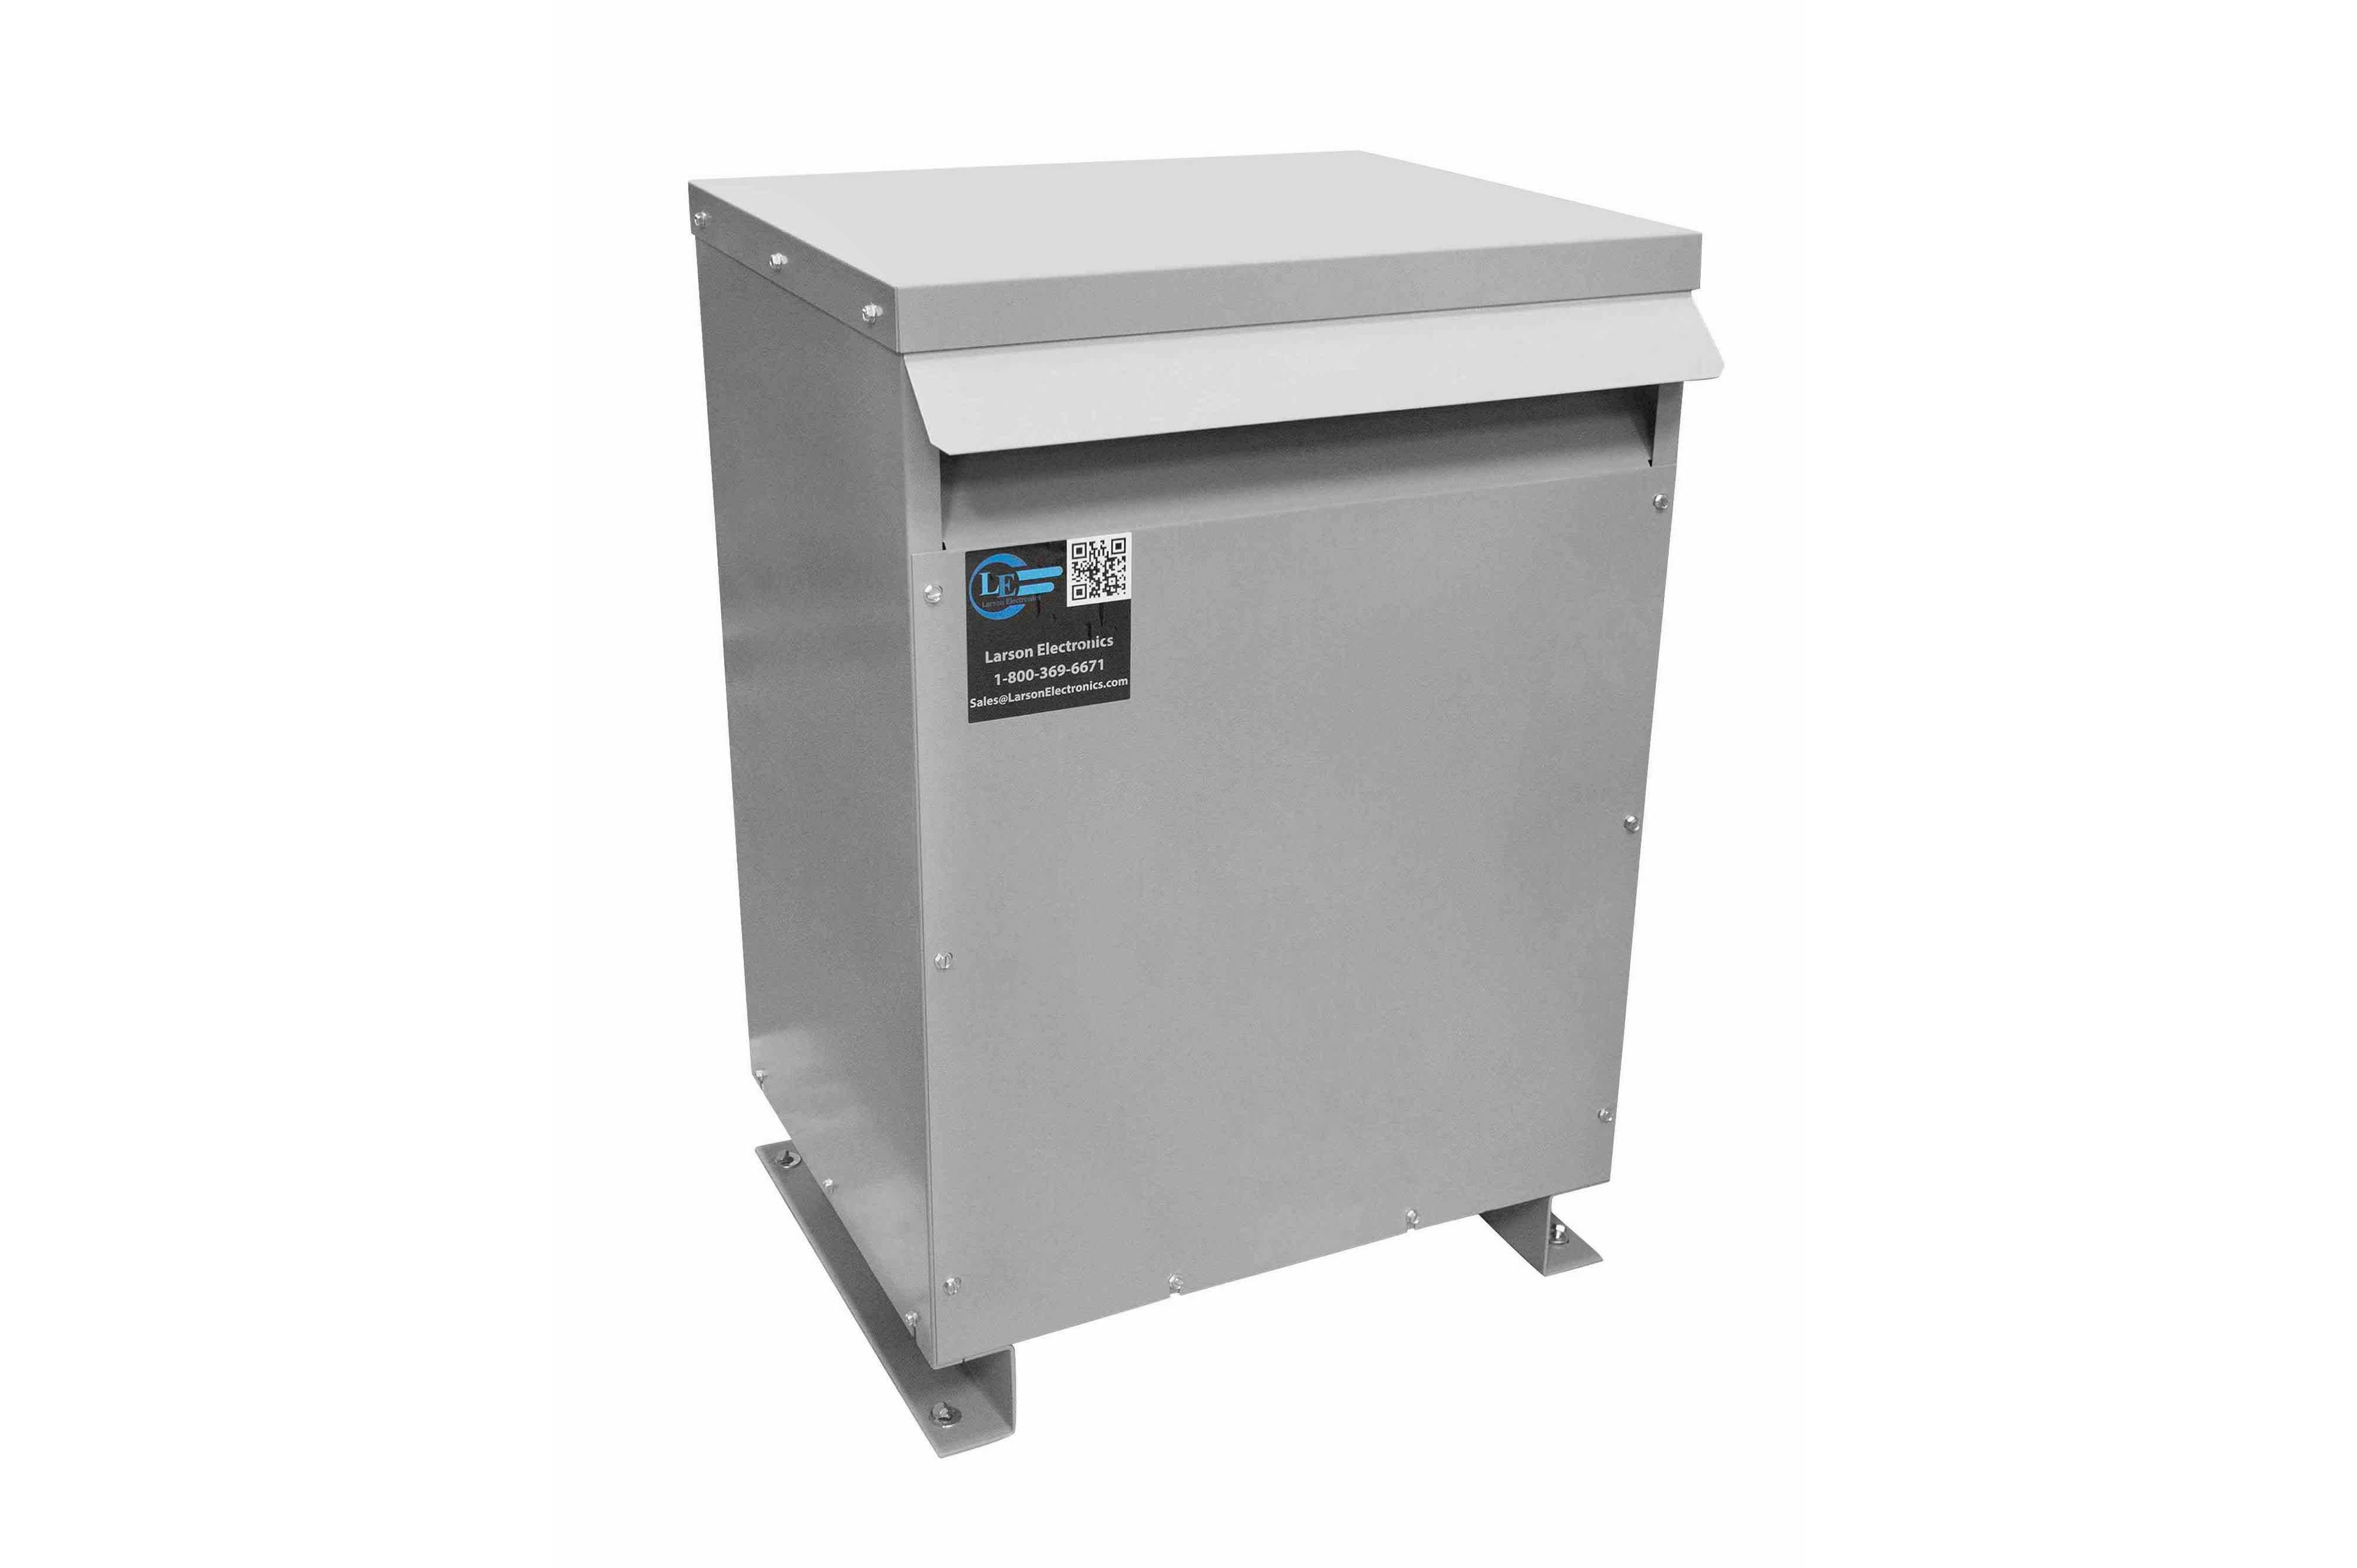 250 kVA 3PH Isolation Transformer, 400V Wye Primary, 480V Delta Secondary, N3R, Ventilated, 60 Hz